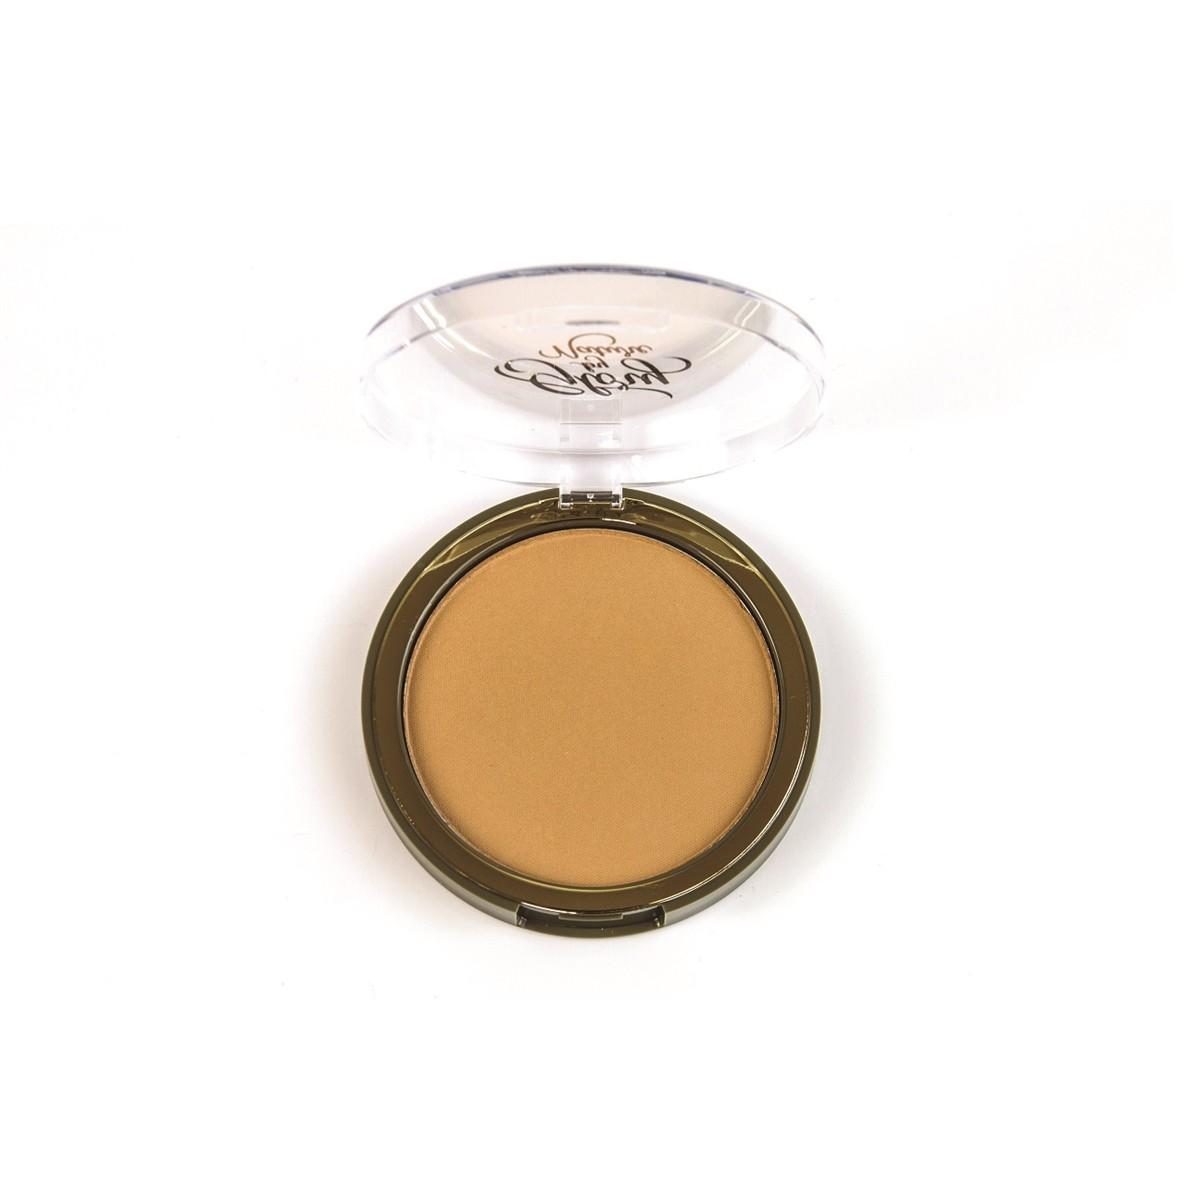 Pó Compacto Natural e Vegano Honey Glory by Nature 10 g